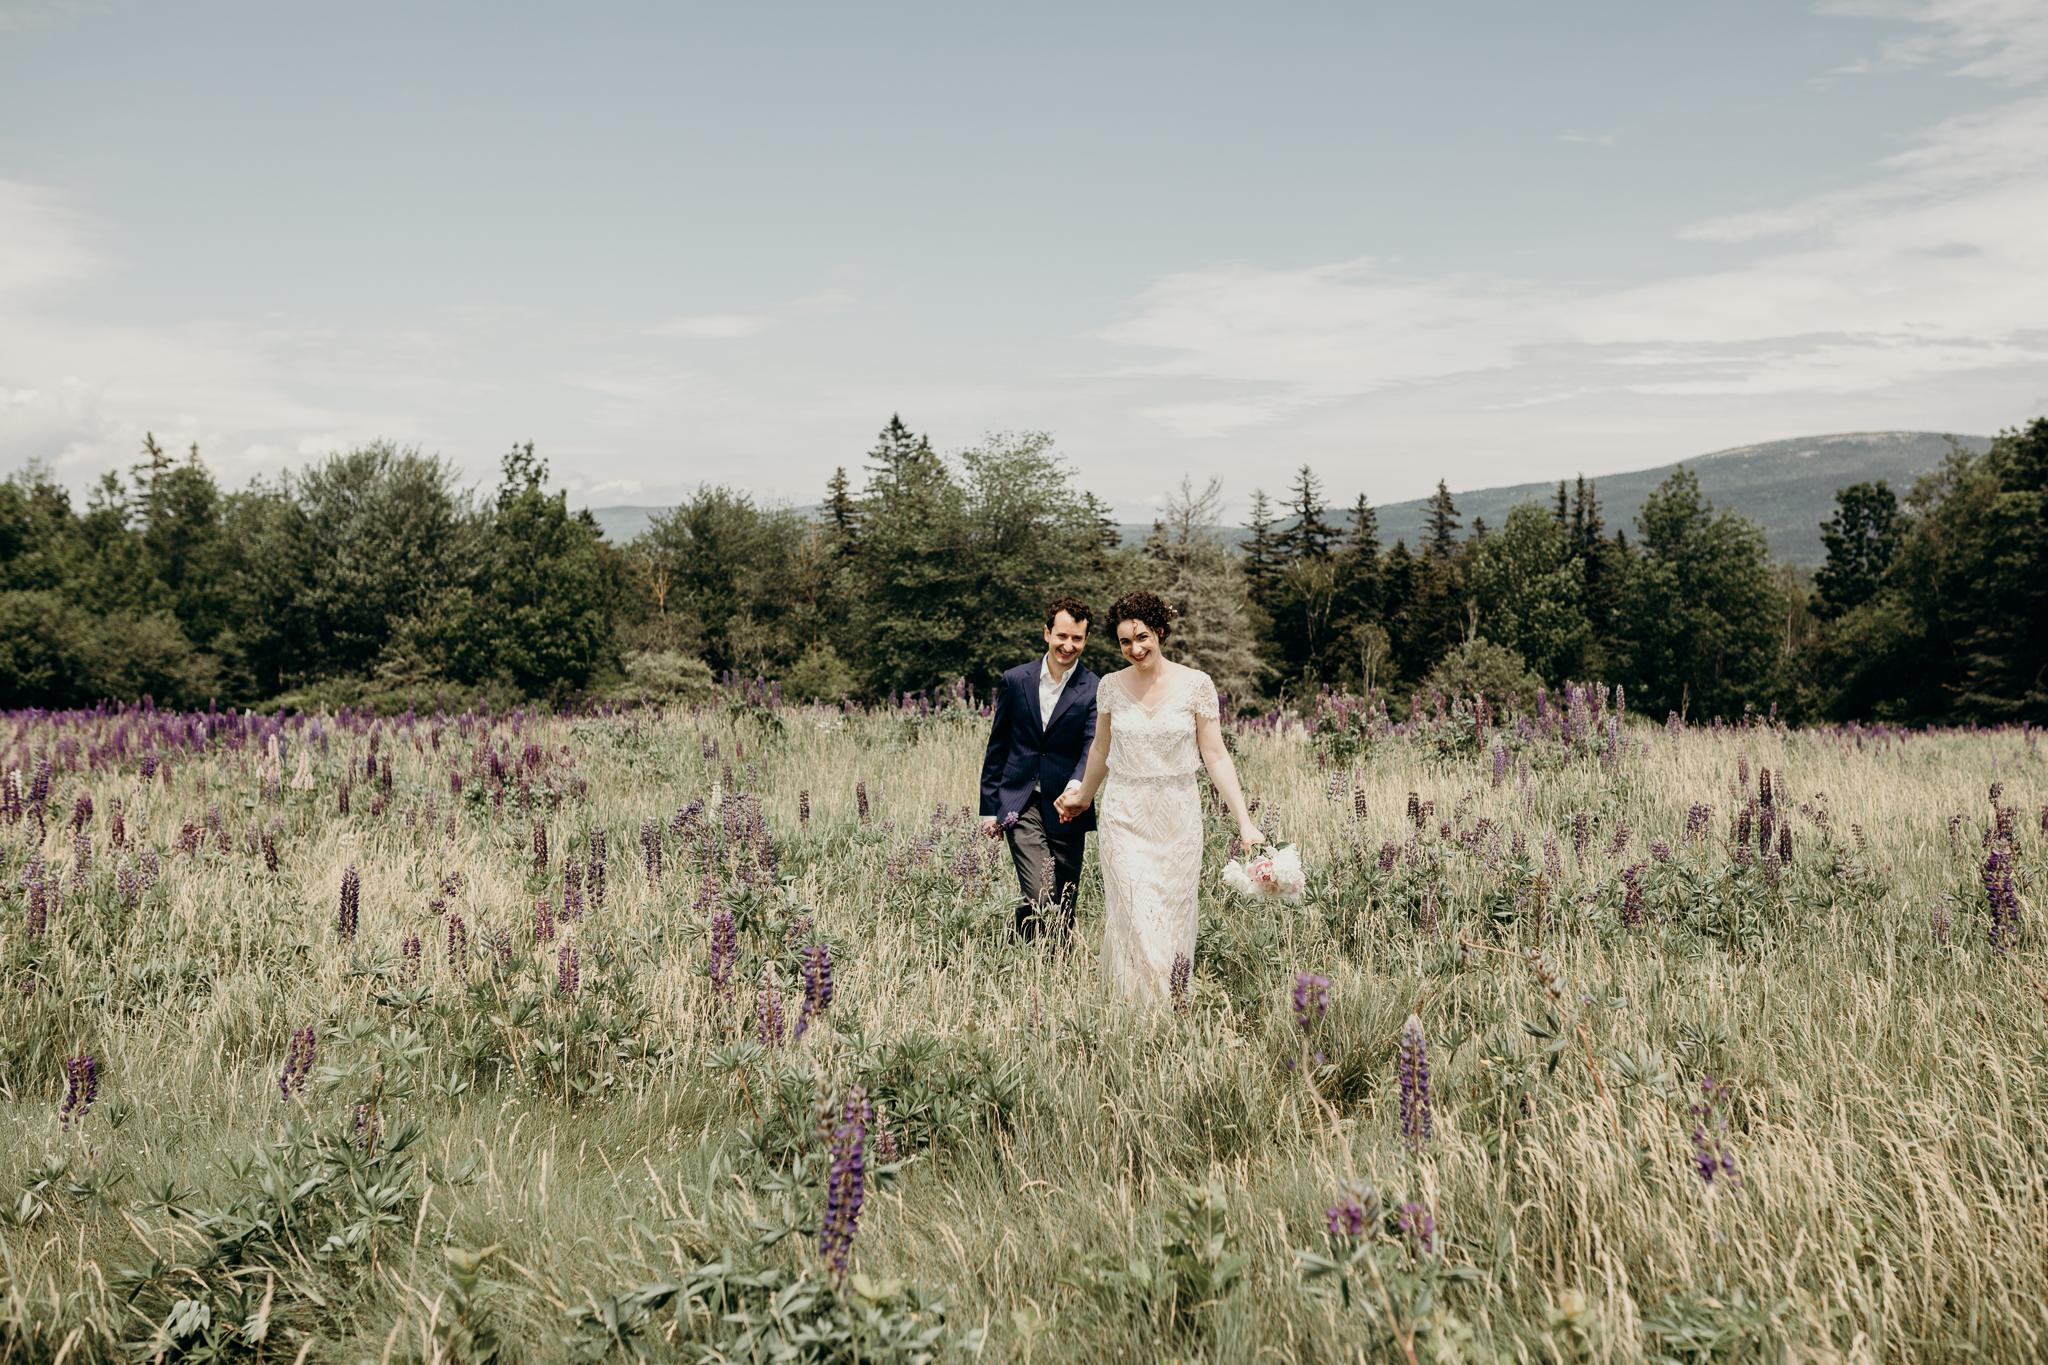 erinwheatco-9102 Maine Wedding by the Sea | Ruth & Ryan